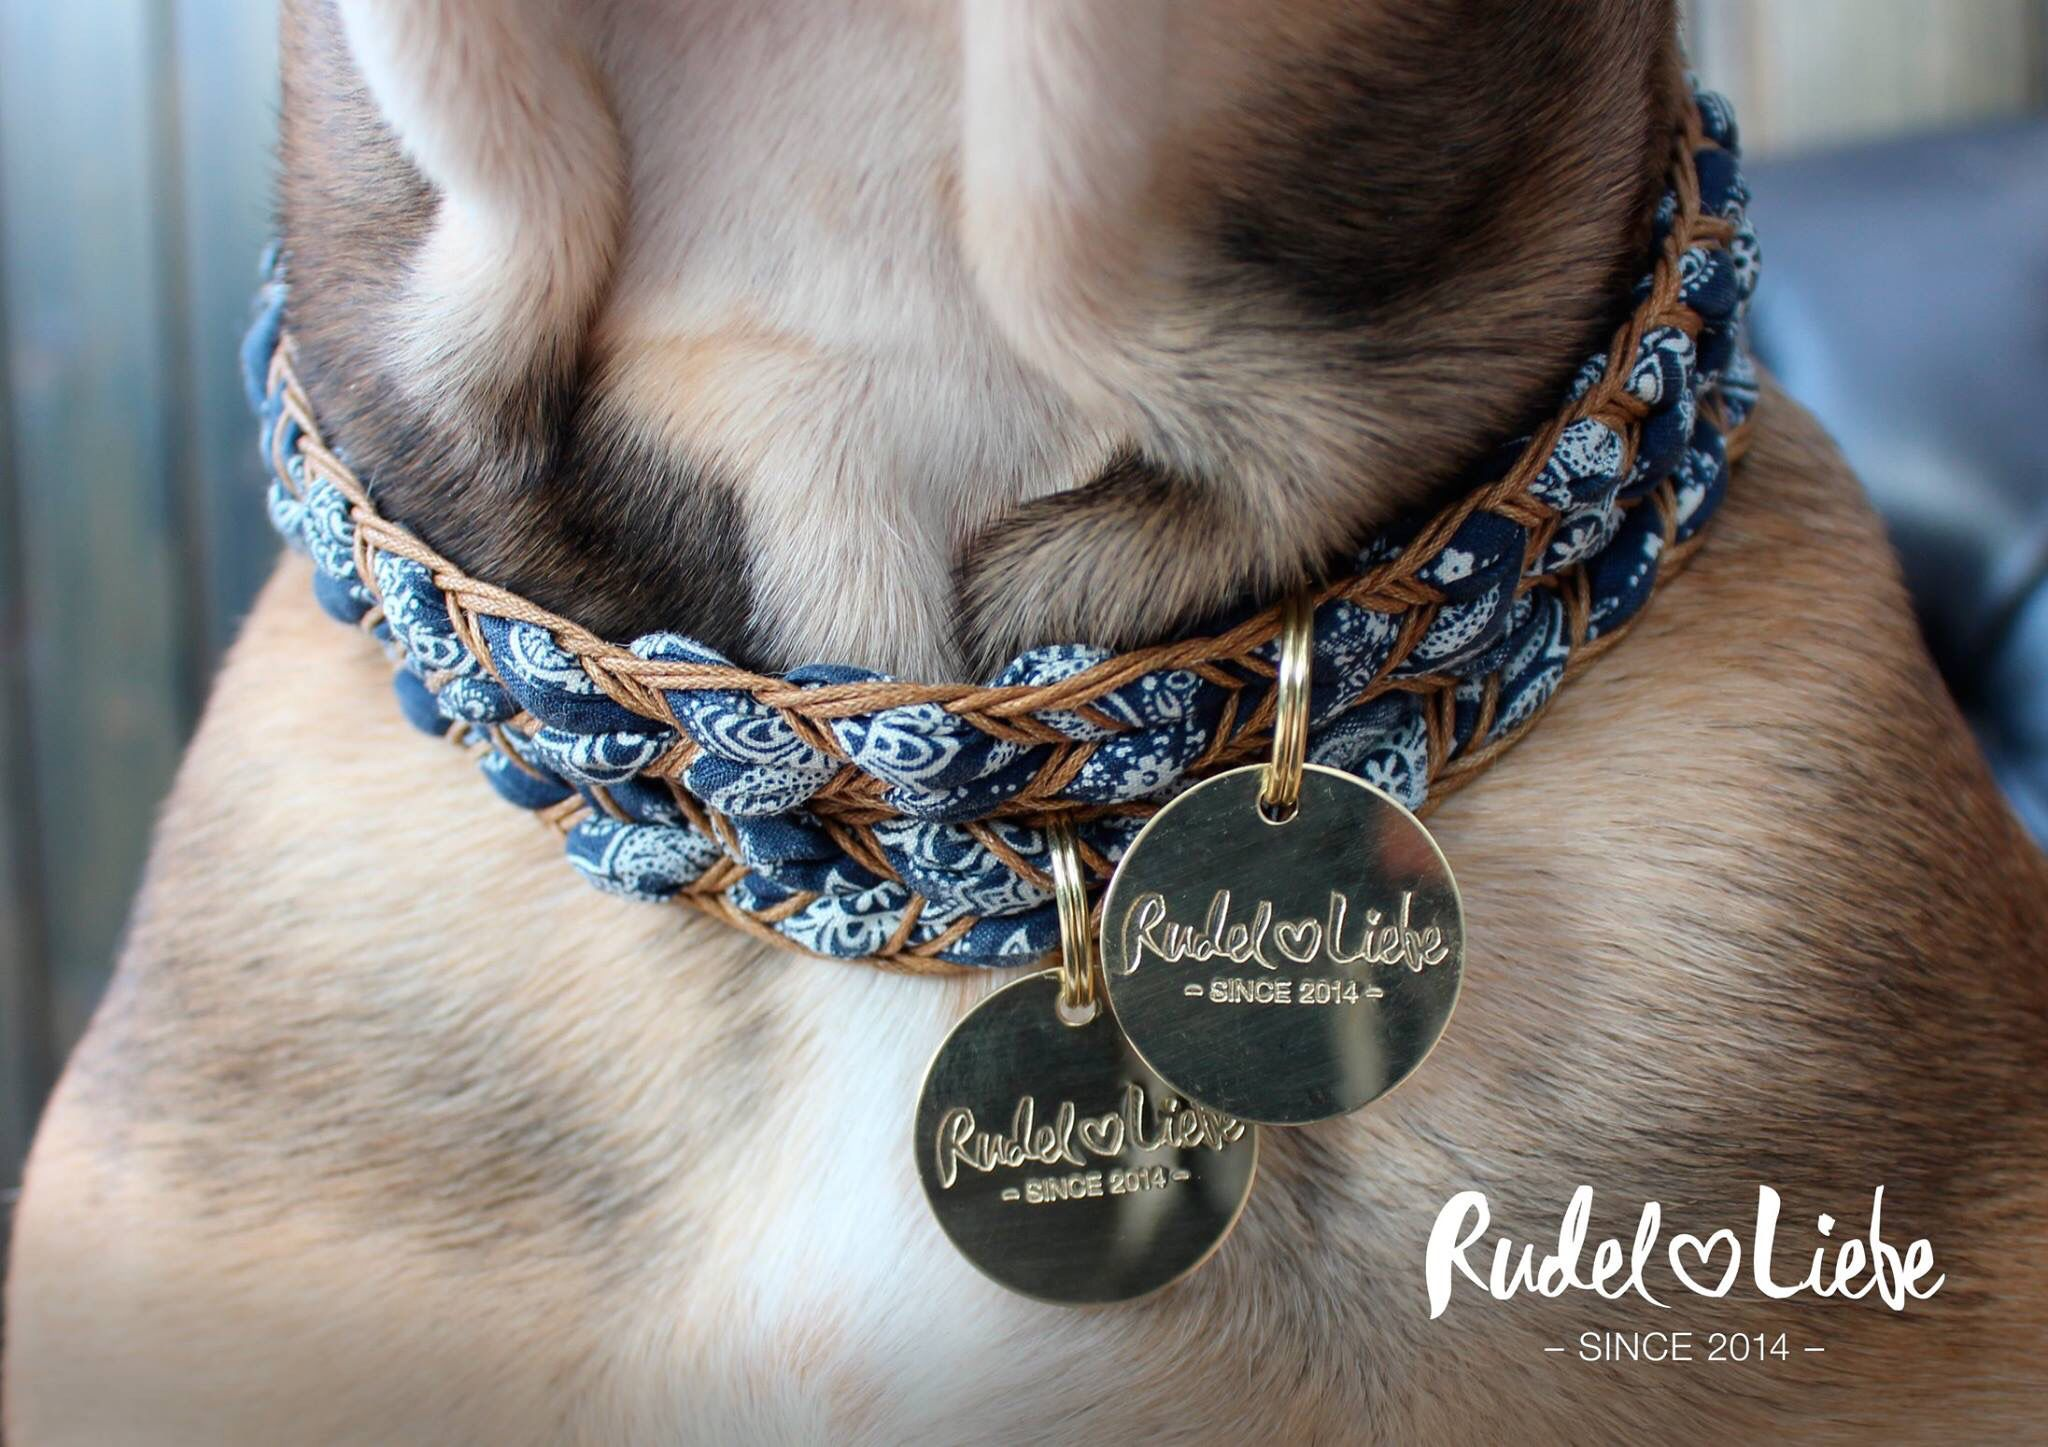 Bloom Dog Accessoire Www Rudelliebe De Halskette Hunde Hundehalskette Hund Hunde Hundehalsband Hundeleine Hunde Accessoires Hundehalsband Halskette Hund